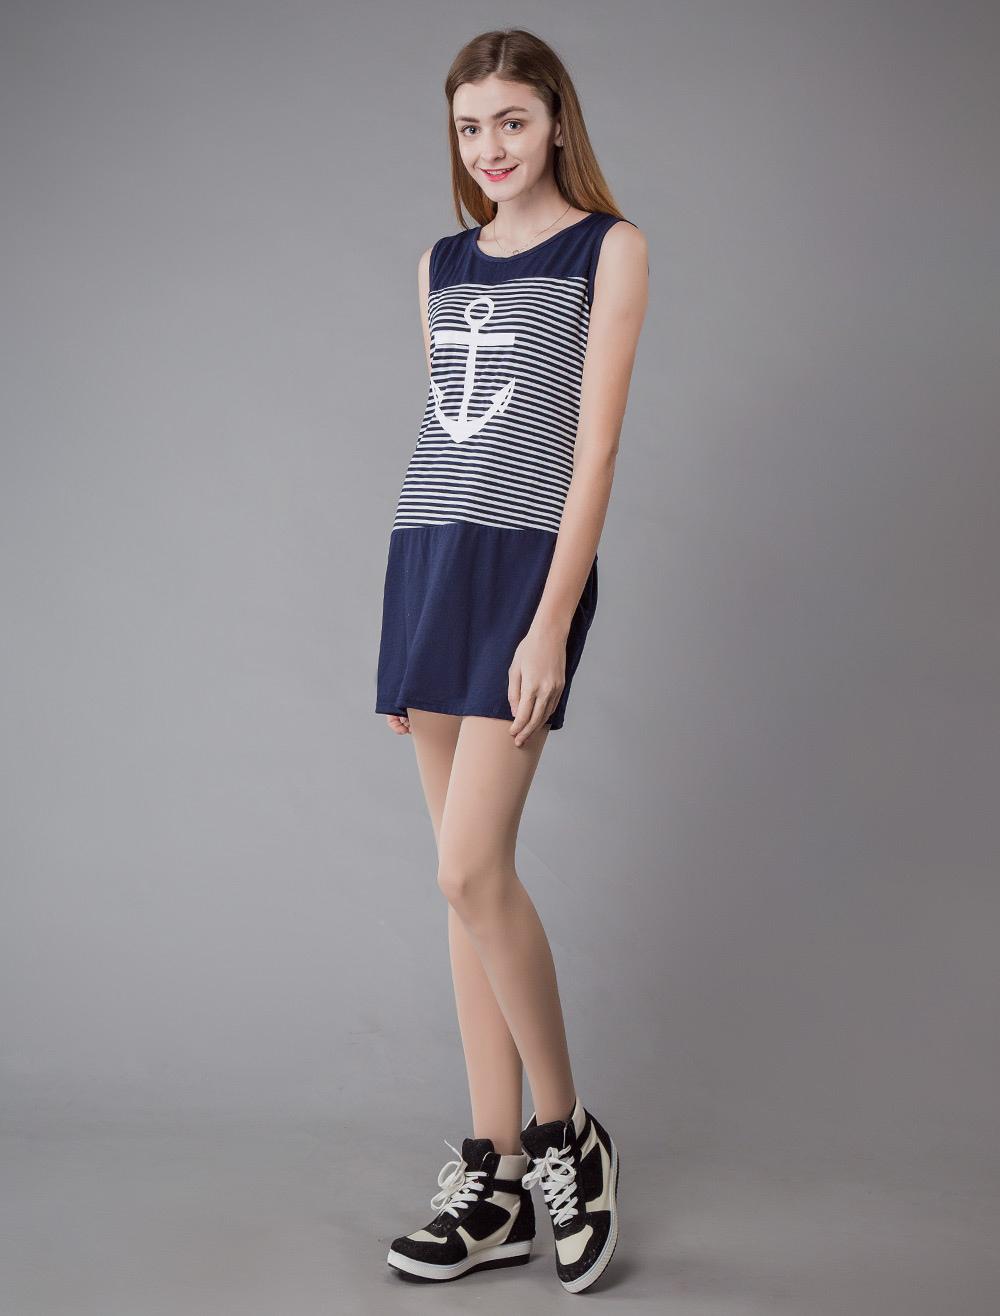 54d9003ccb859 ... Dresses for Women Sailor Style Sleeveless Mini Dress Striped Bodycon  Dress -No.4 ...